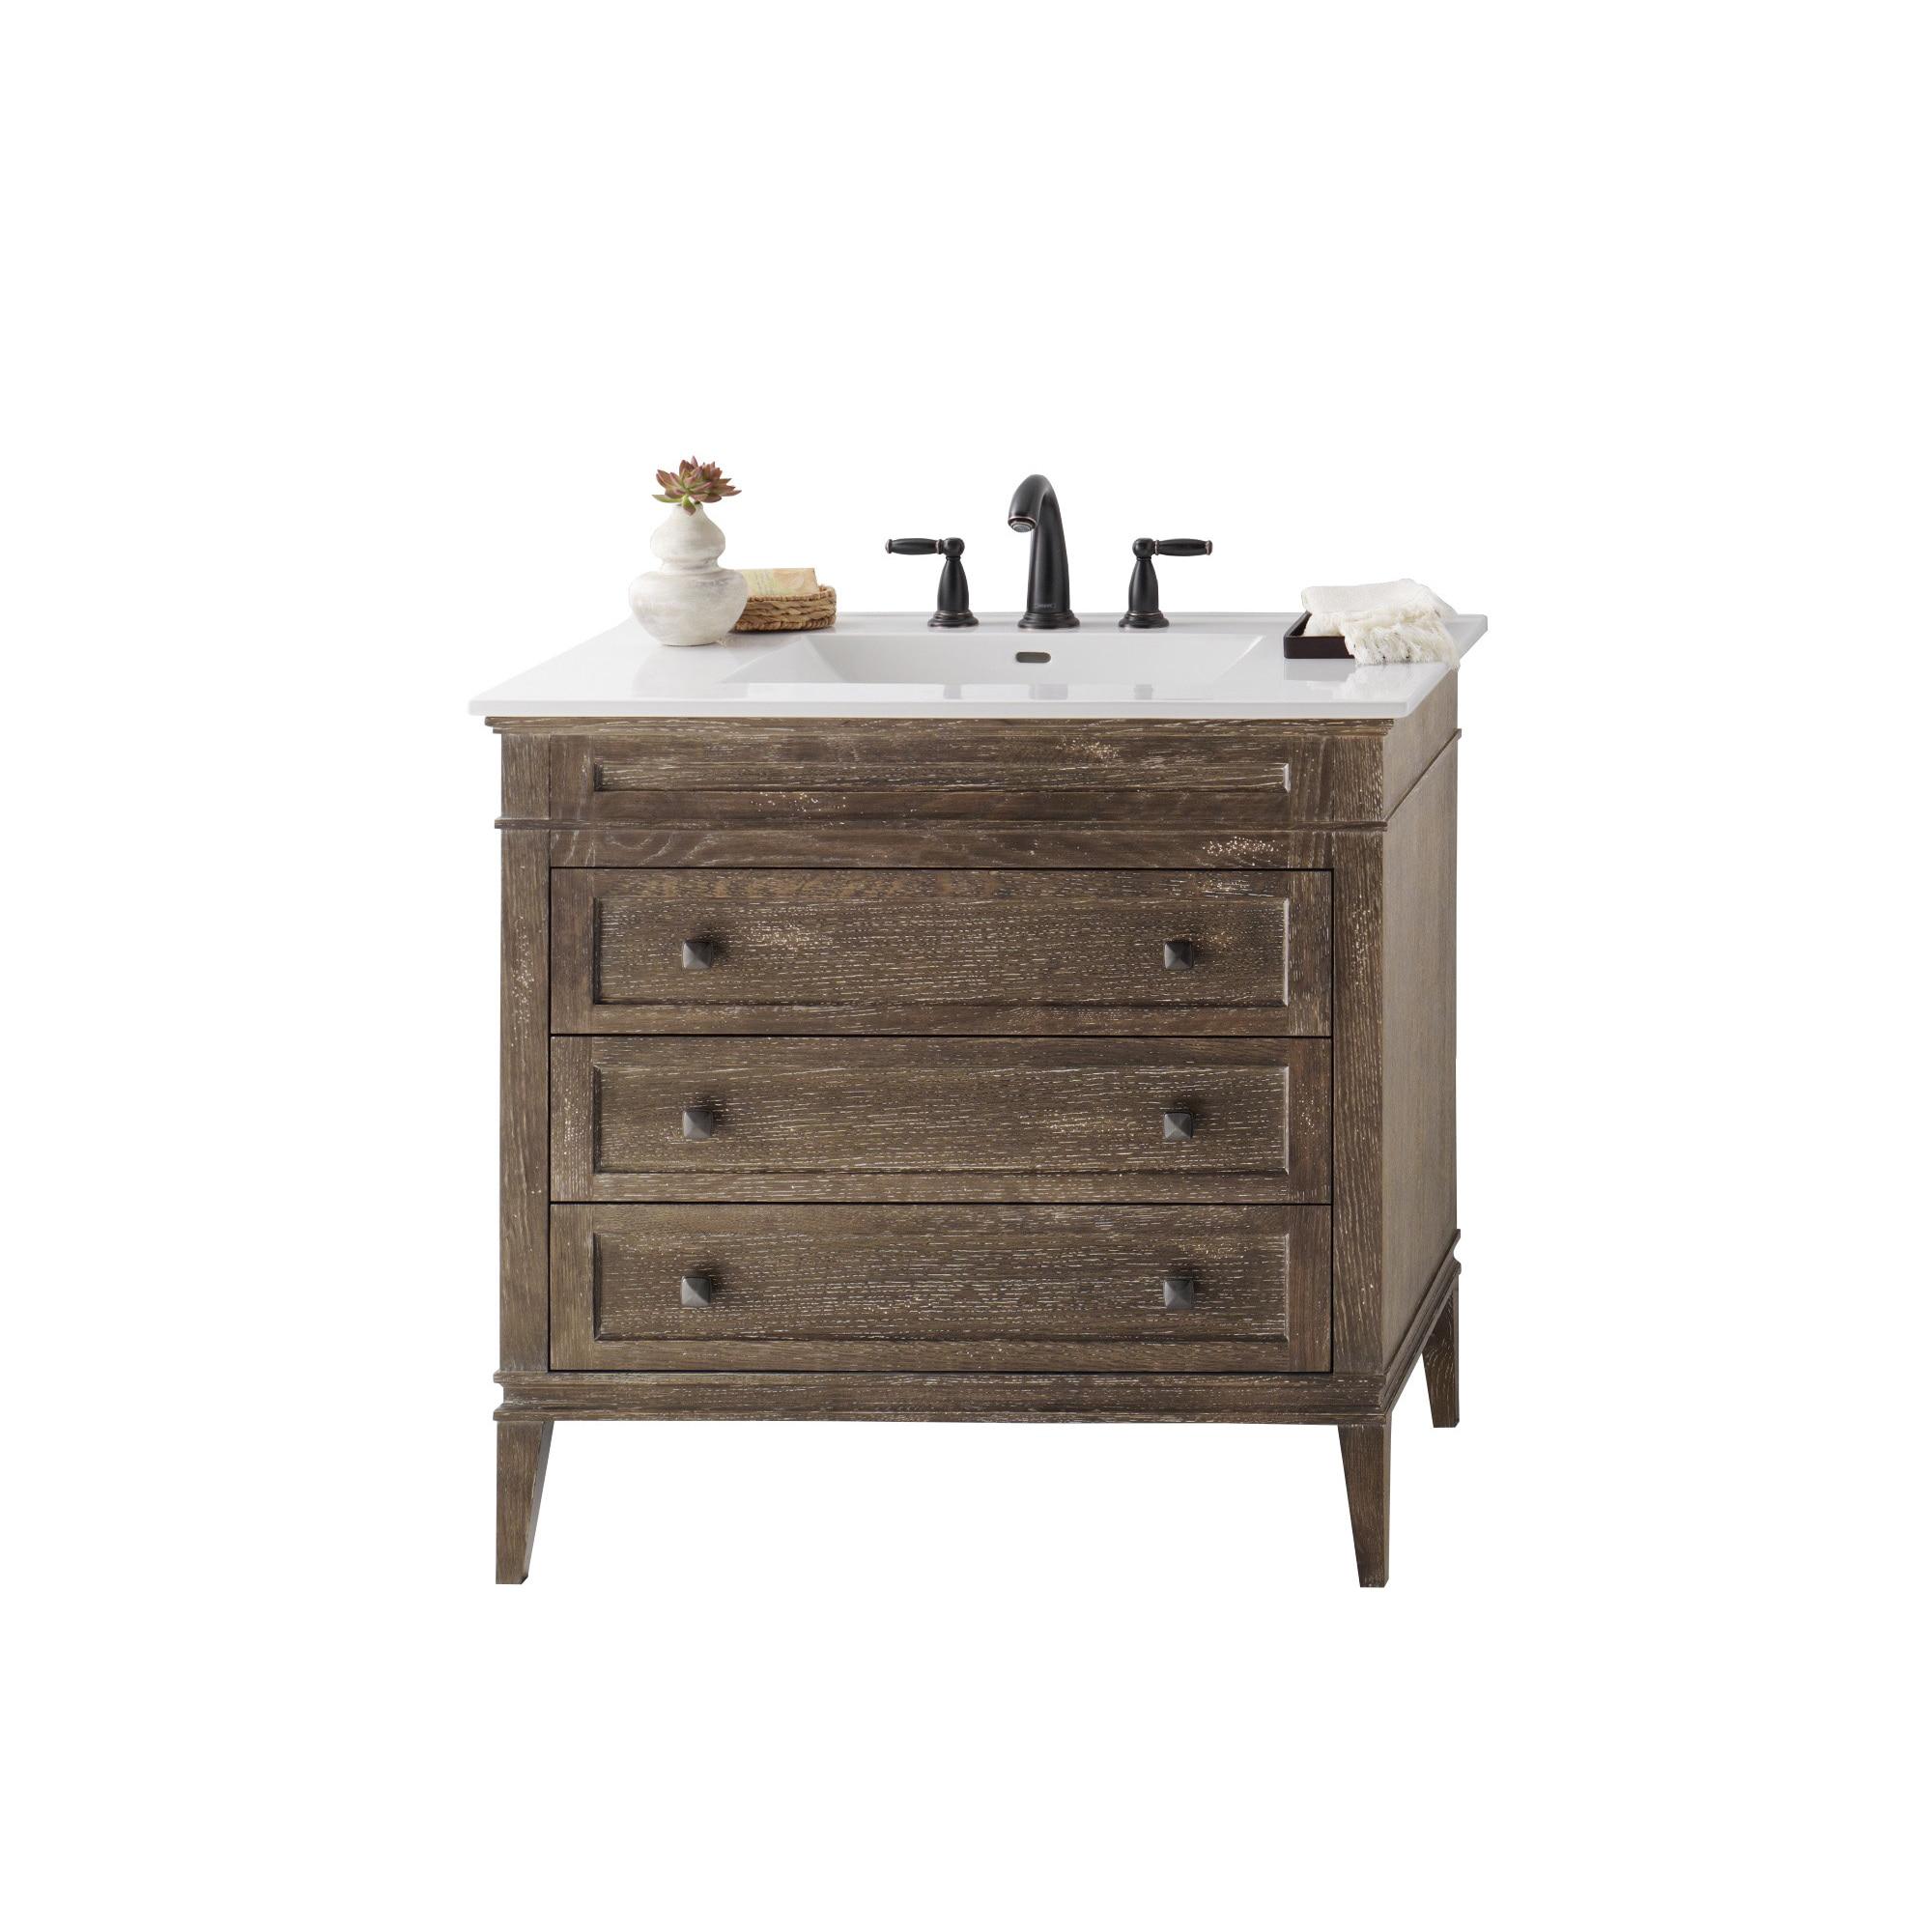 midori home bathtub the gr collections image design elegant of sink virtu luxury ideas double bathroom inch jd grey vanity best